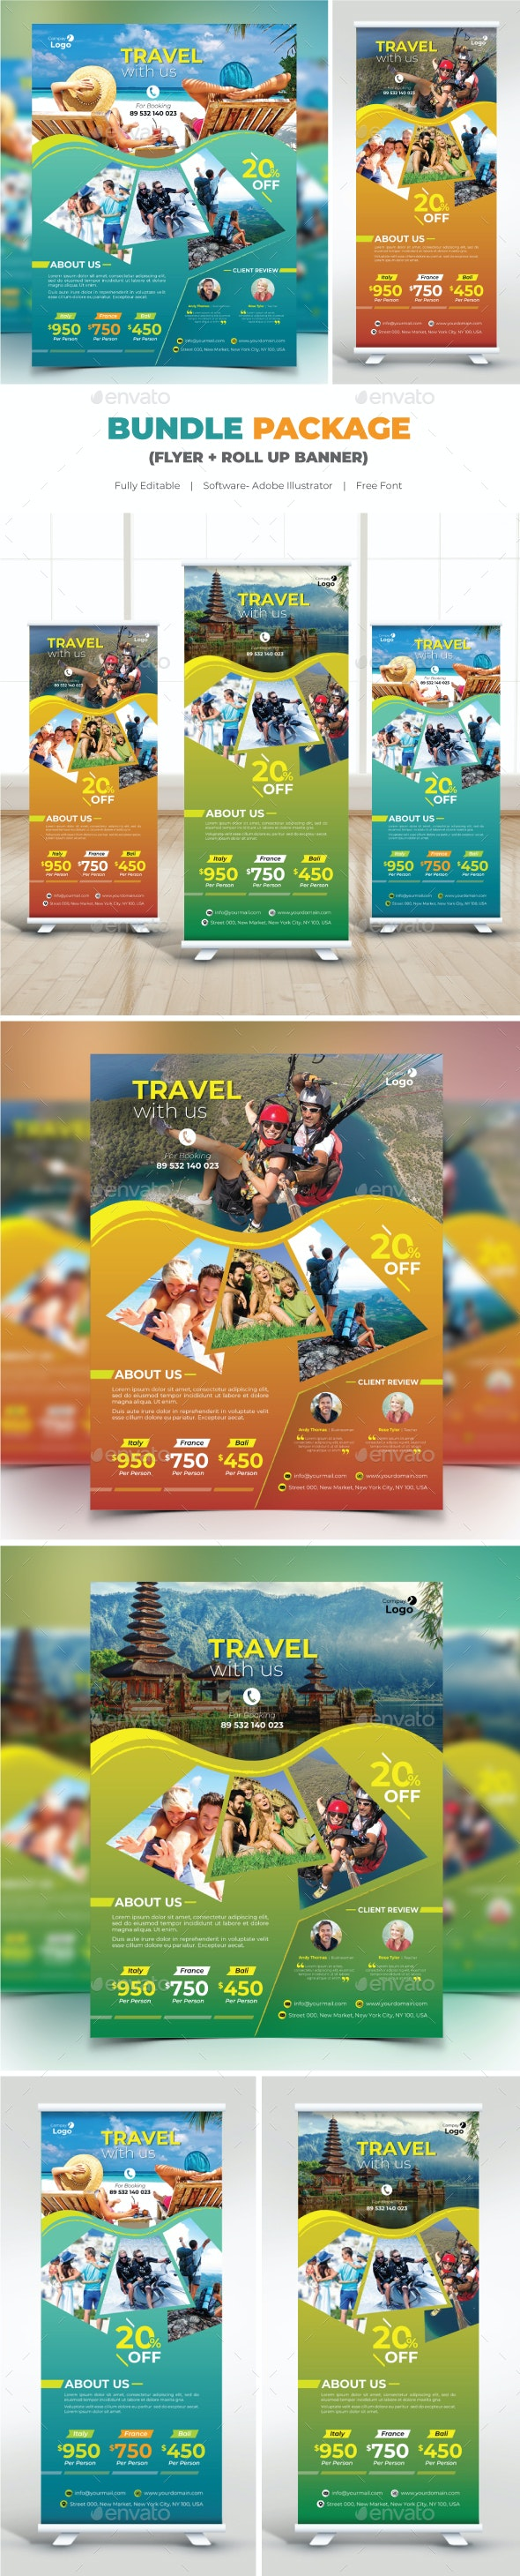 Bundle Travel (Flyer+Roll Up Banner) - Flyers Print Templates